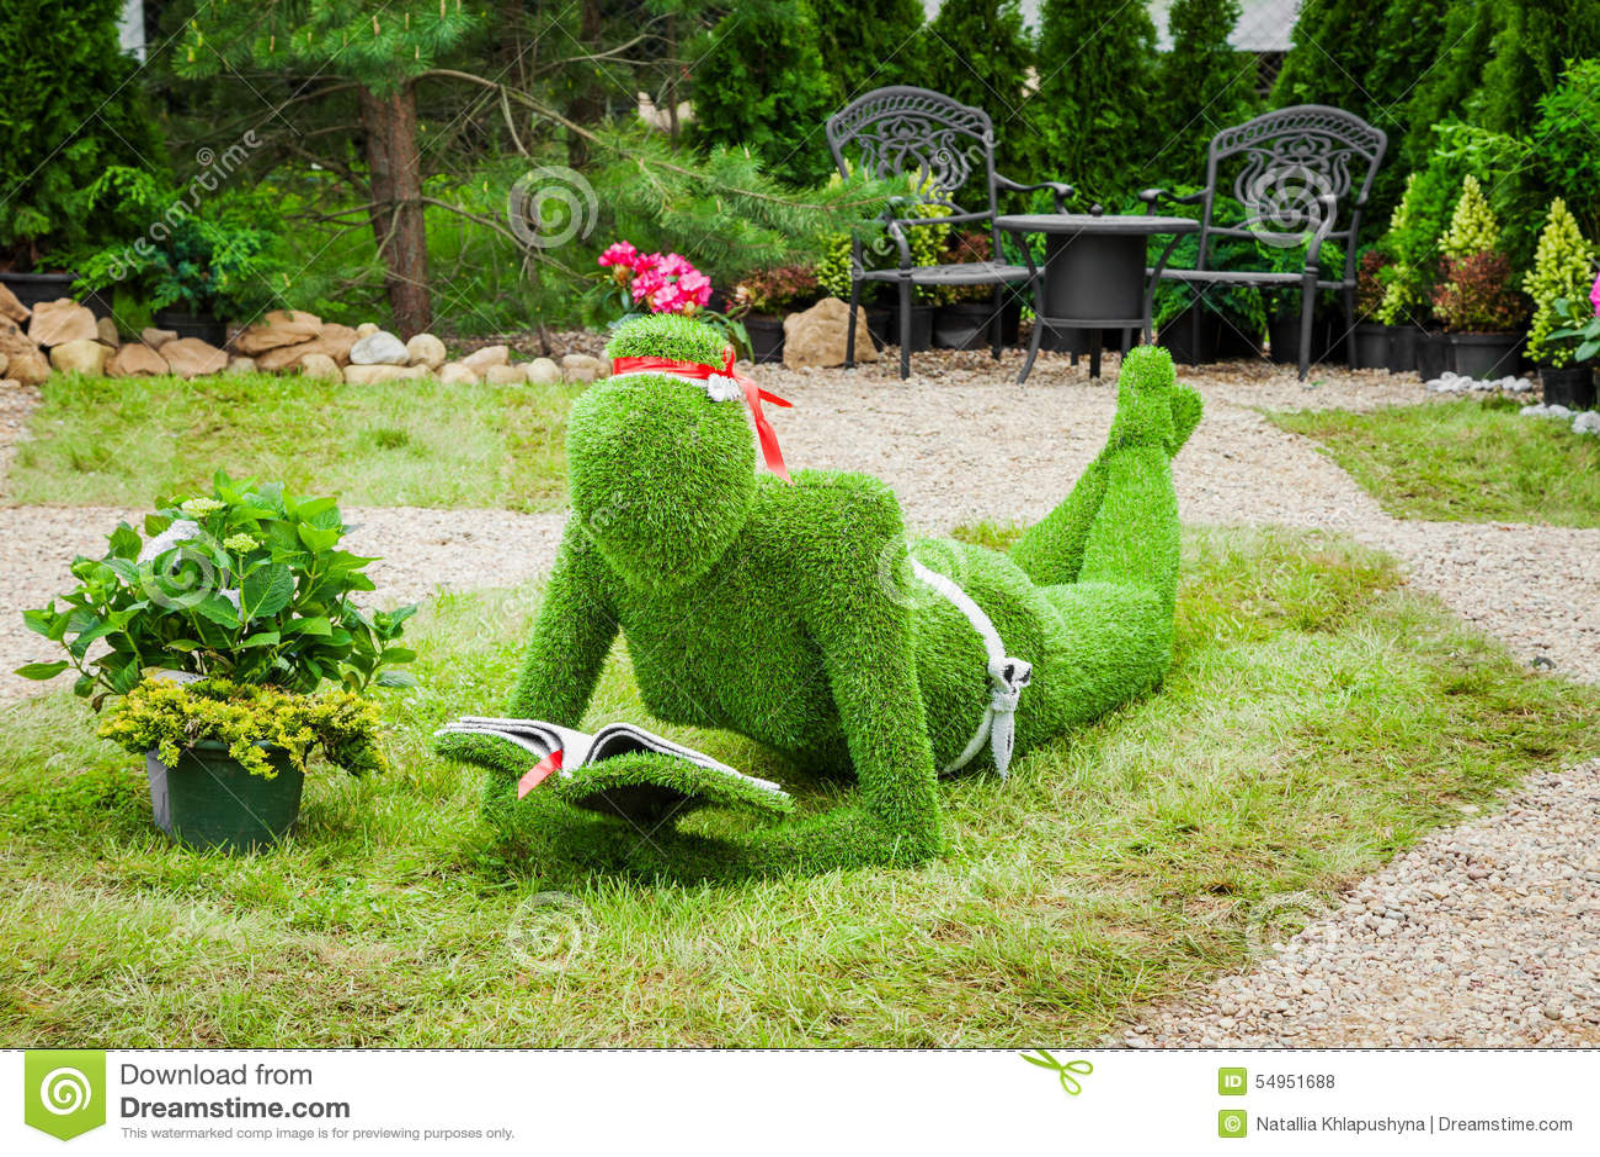 minsk wei russland 23 may 2015 garten skulptur vom gras redaktionelles stockfoto bild 54951688. Black Bedroom Furniture Sets. Home Design Ideas